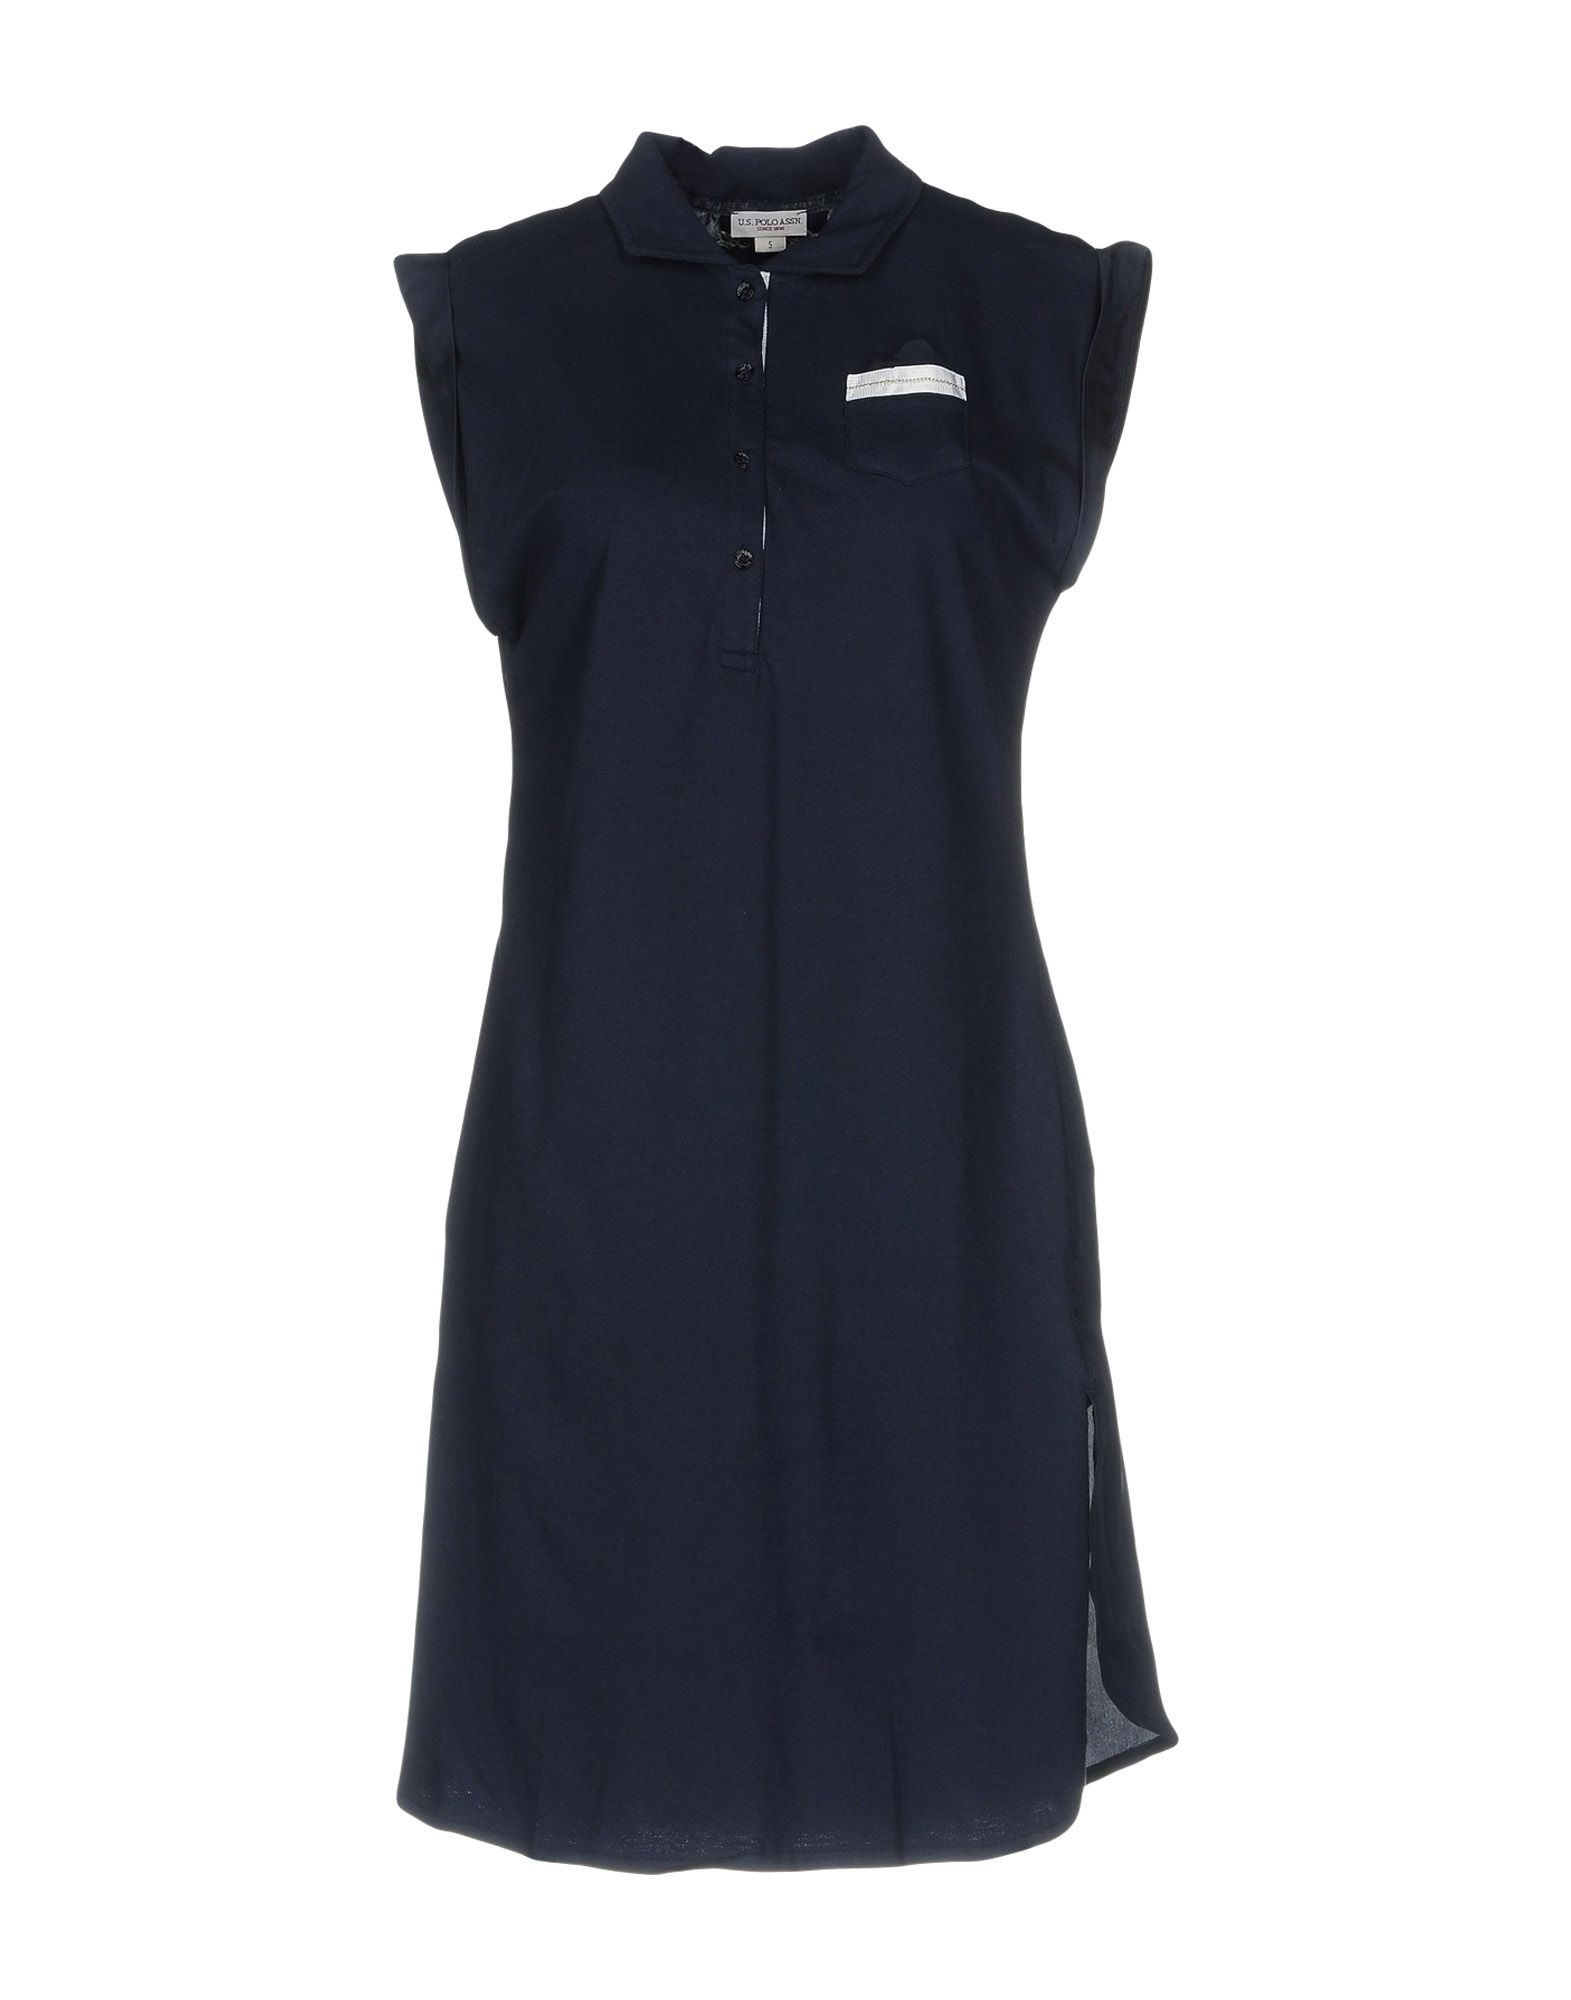 U.S.POLO ASSN. Damen Kurzes Kleid Farbe Dunkelblau Größe 6